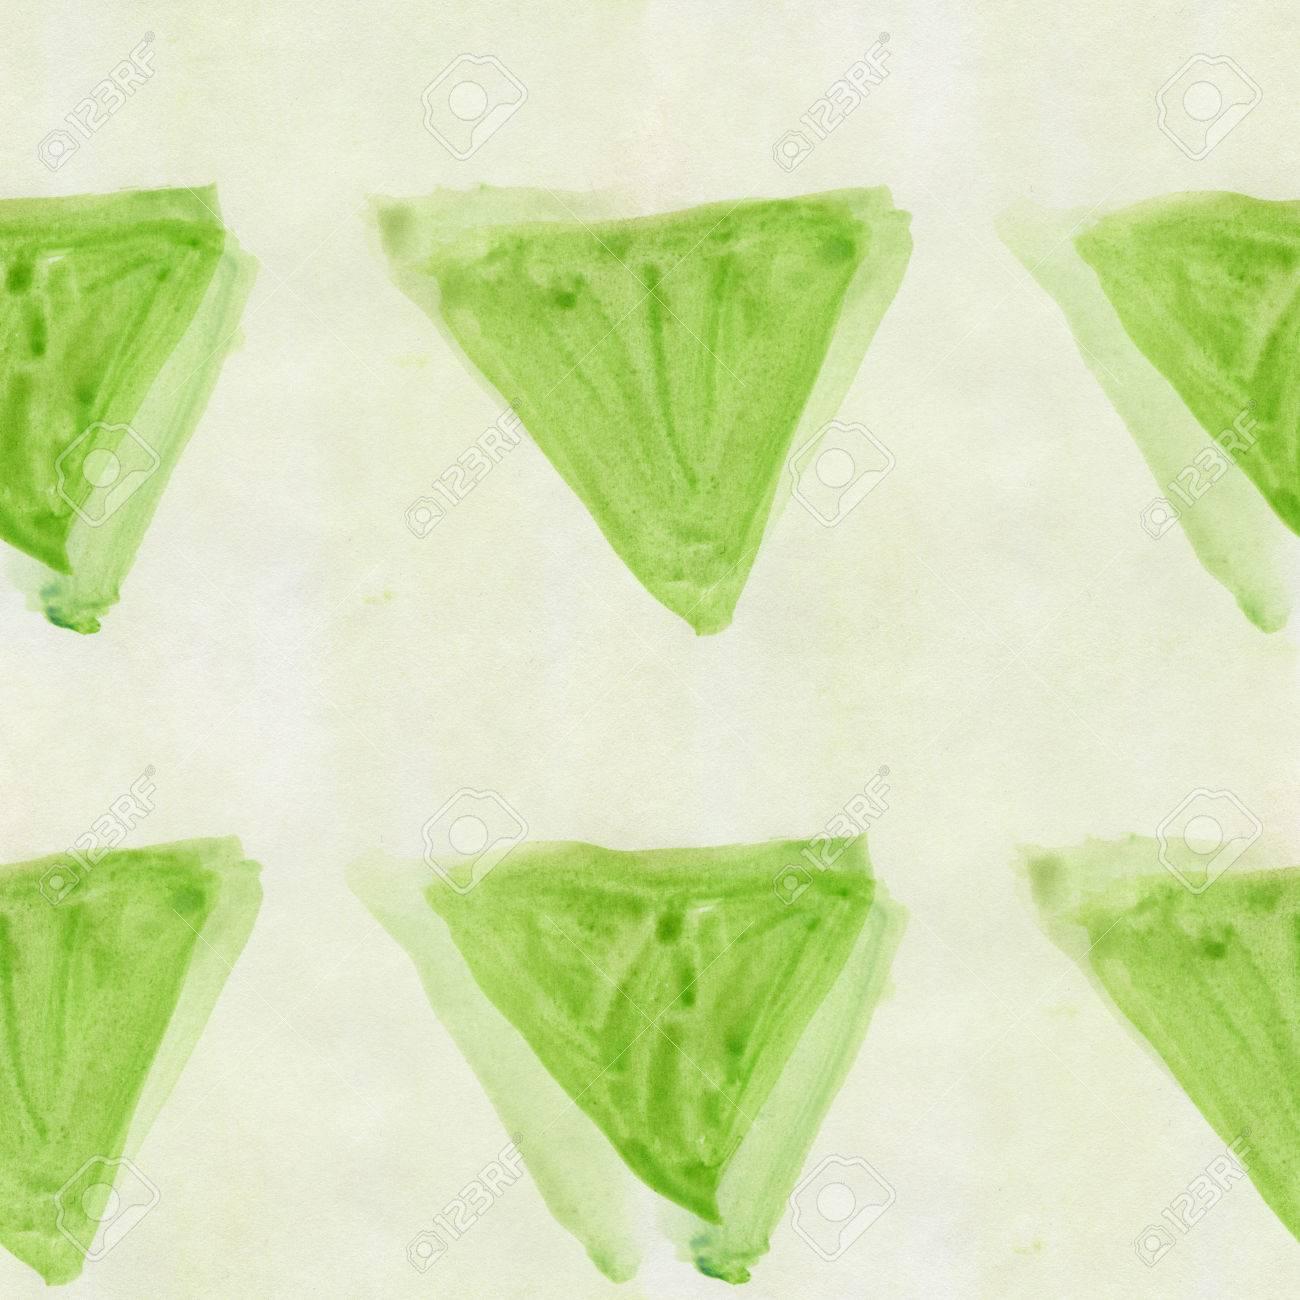 Art Triangulaire Modele Triangle Vert Abstrait Sans Soudure Bande